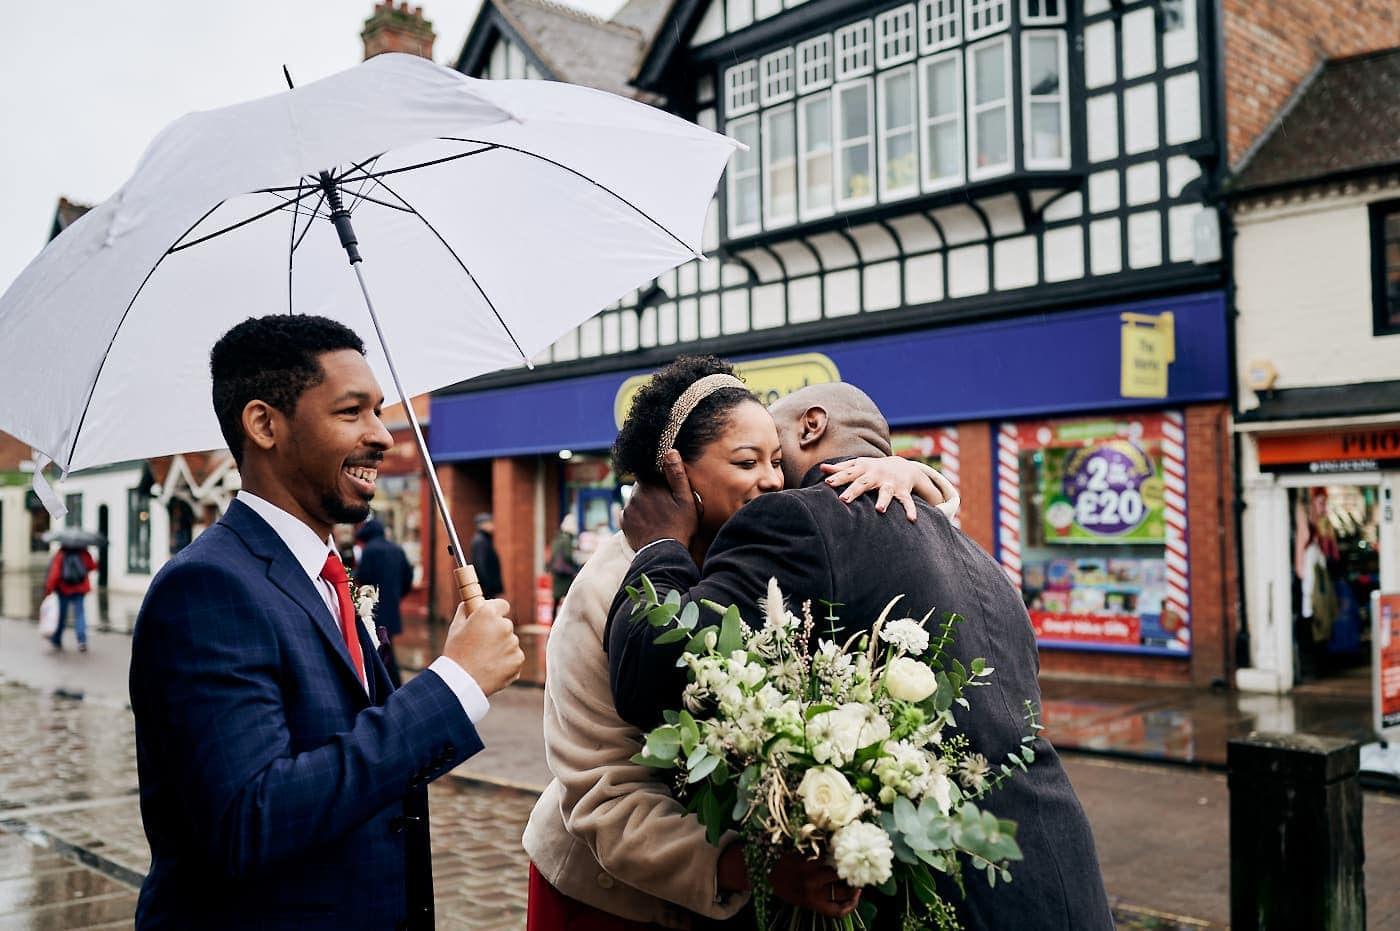 Bride hugs dad after small wedding in Stratford-upon-Avon